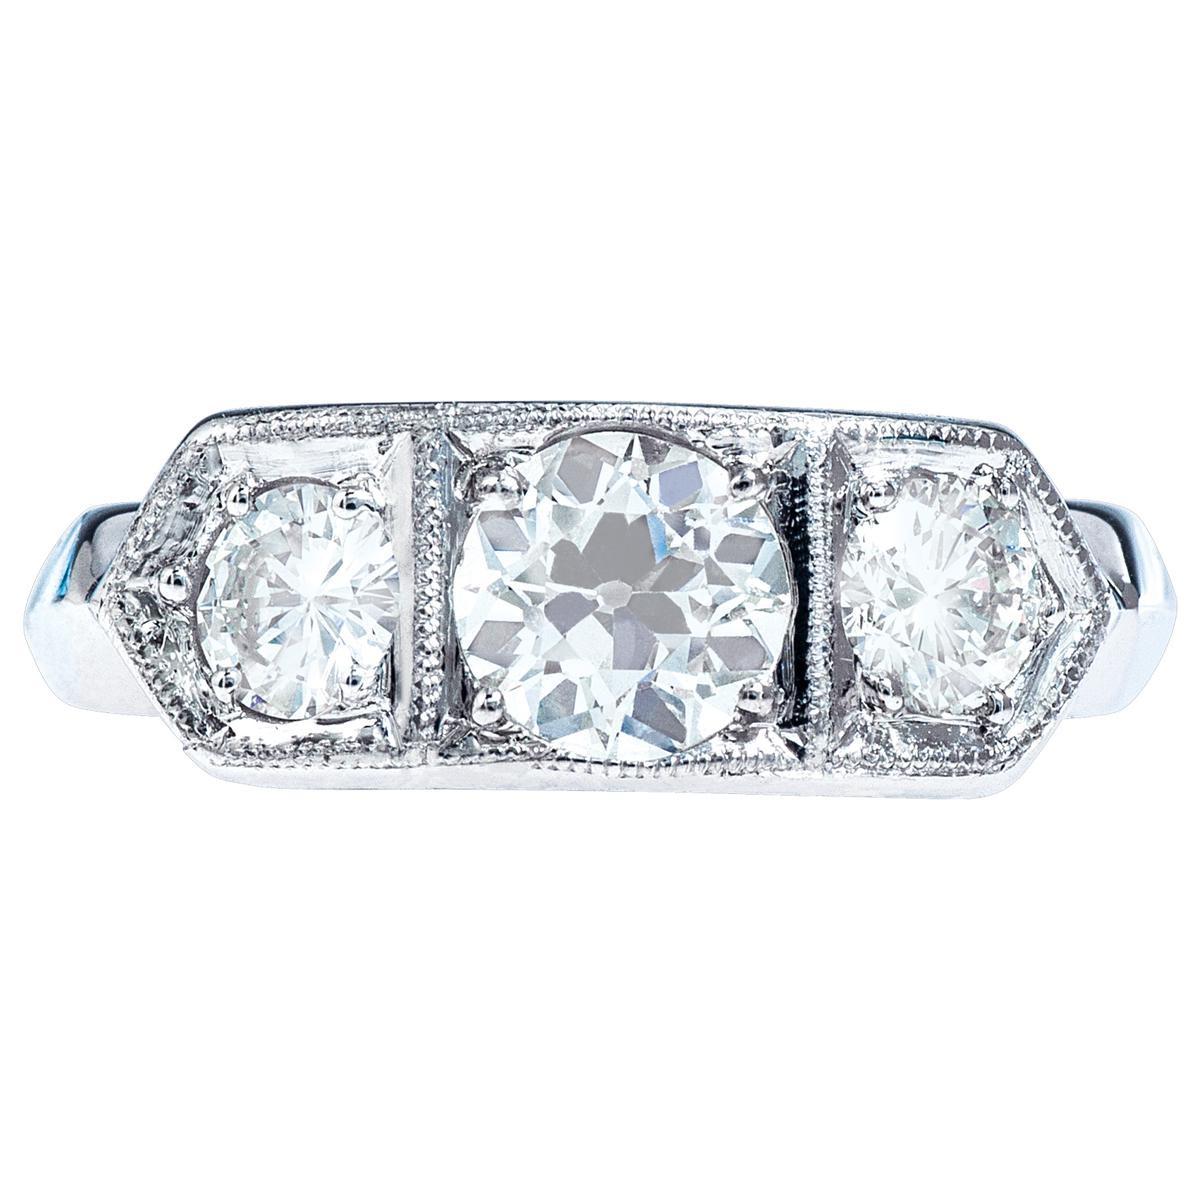 Vintage 1.25 CTW Diamond Engagment Ring